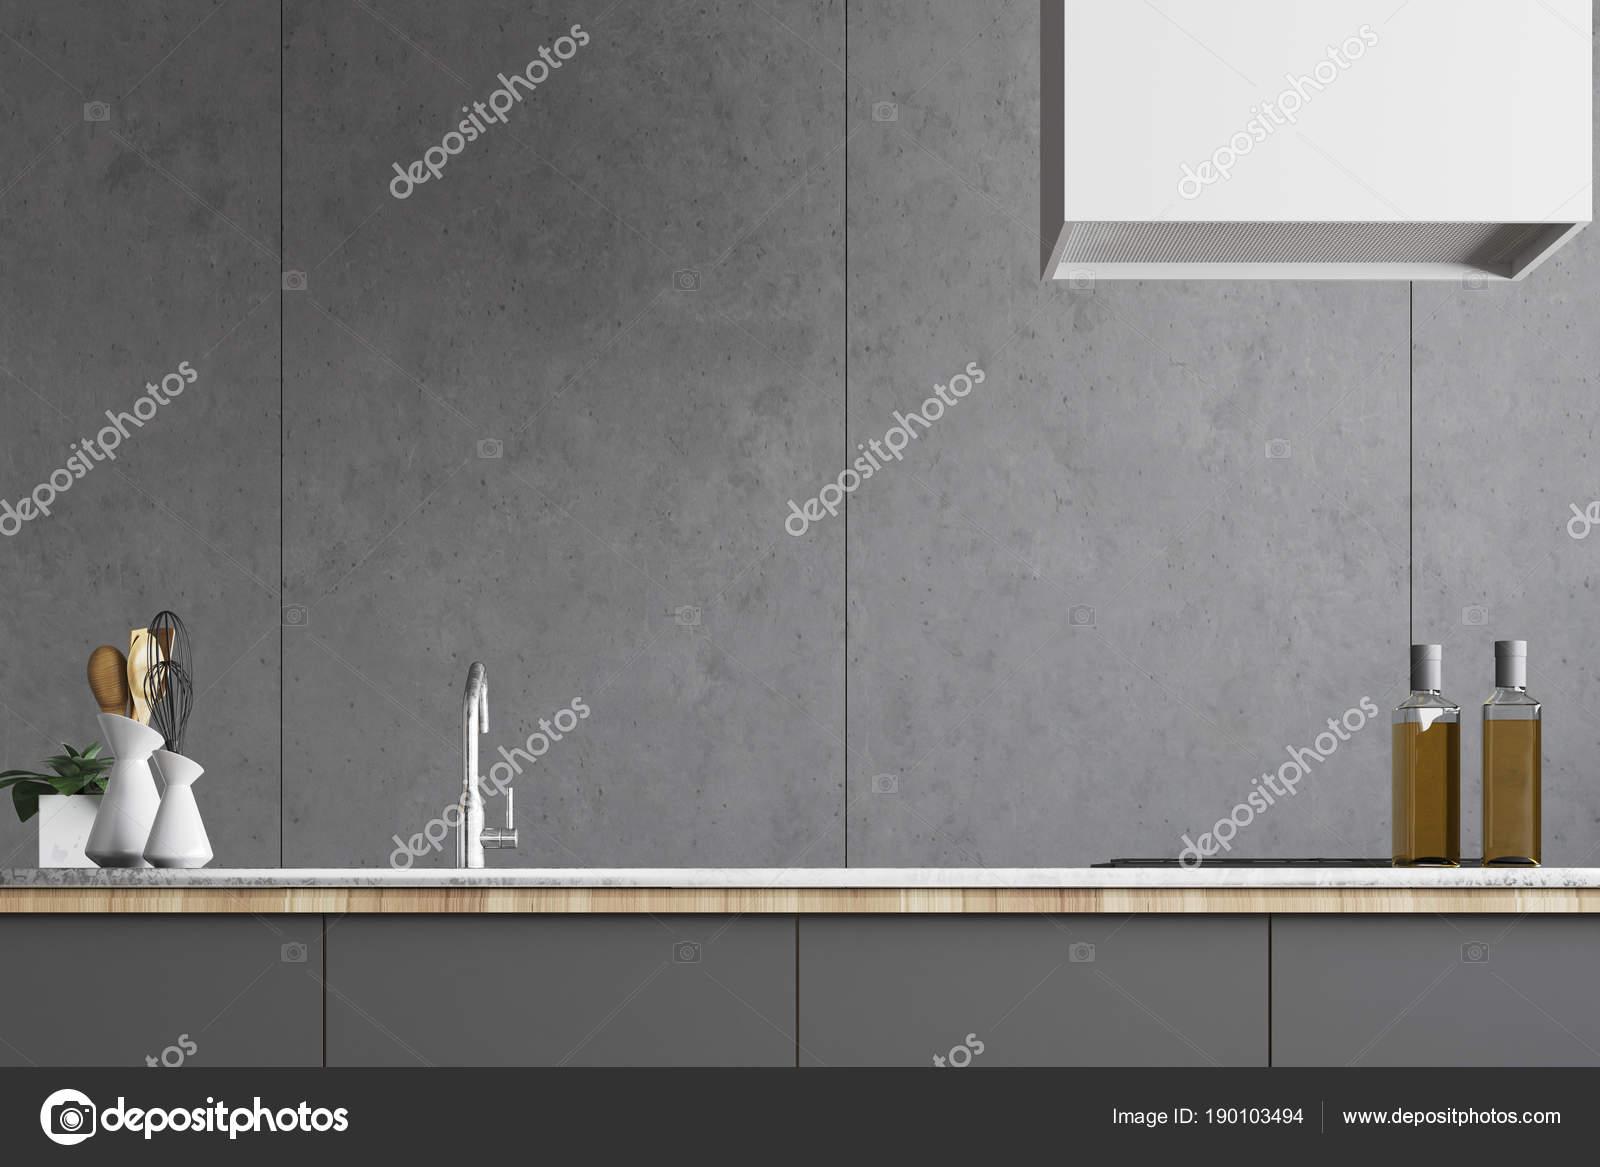 grey kitchen countertops sinks & faucets 灰色厨房台面关闭 图库照片 c denisismagilov 190103494